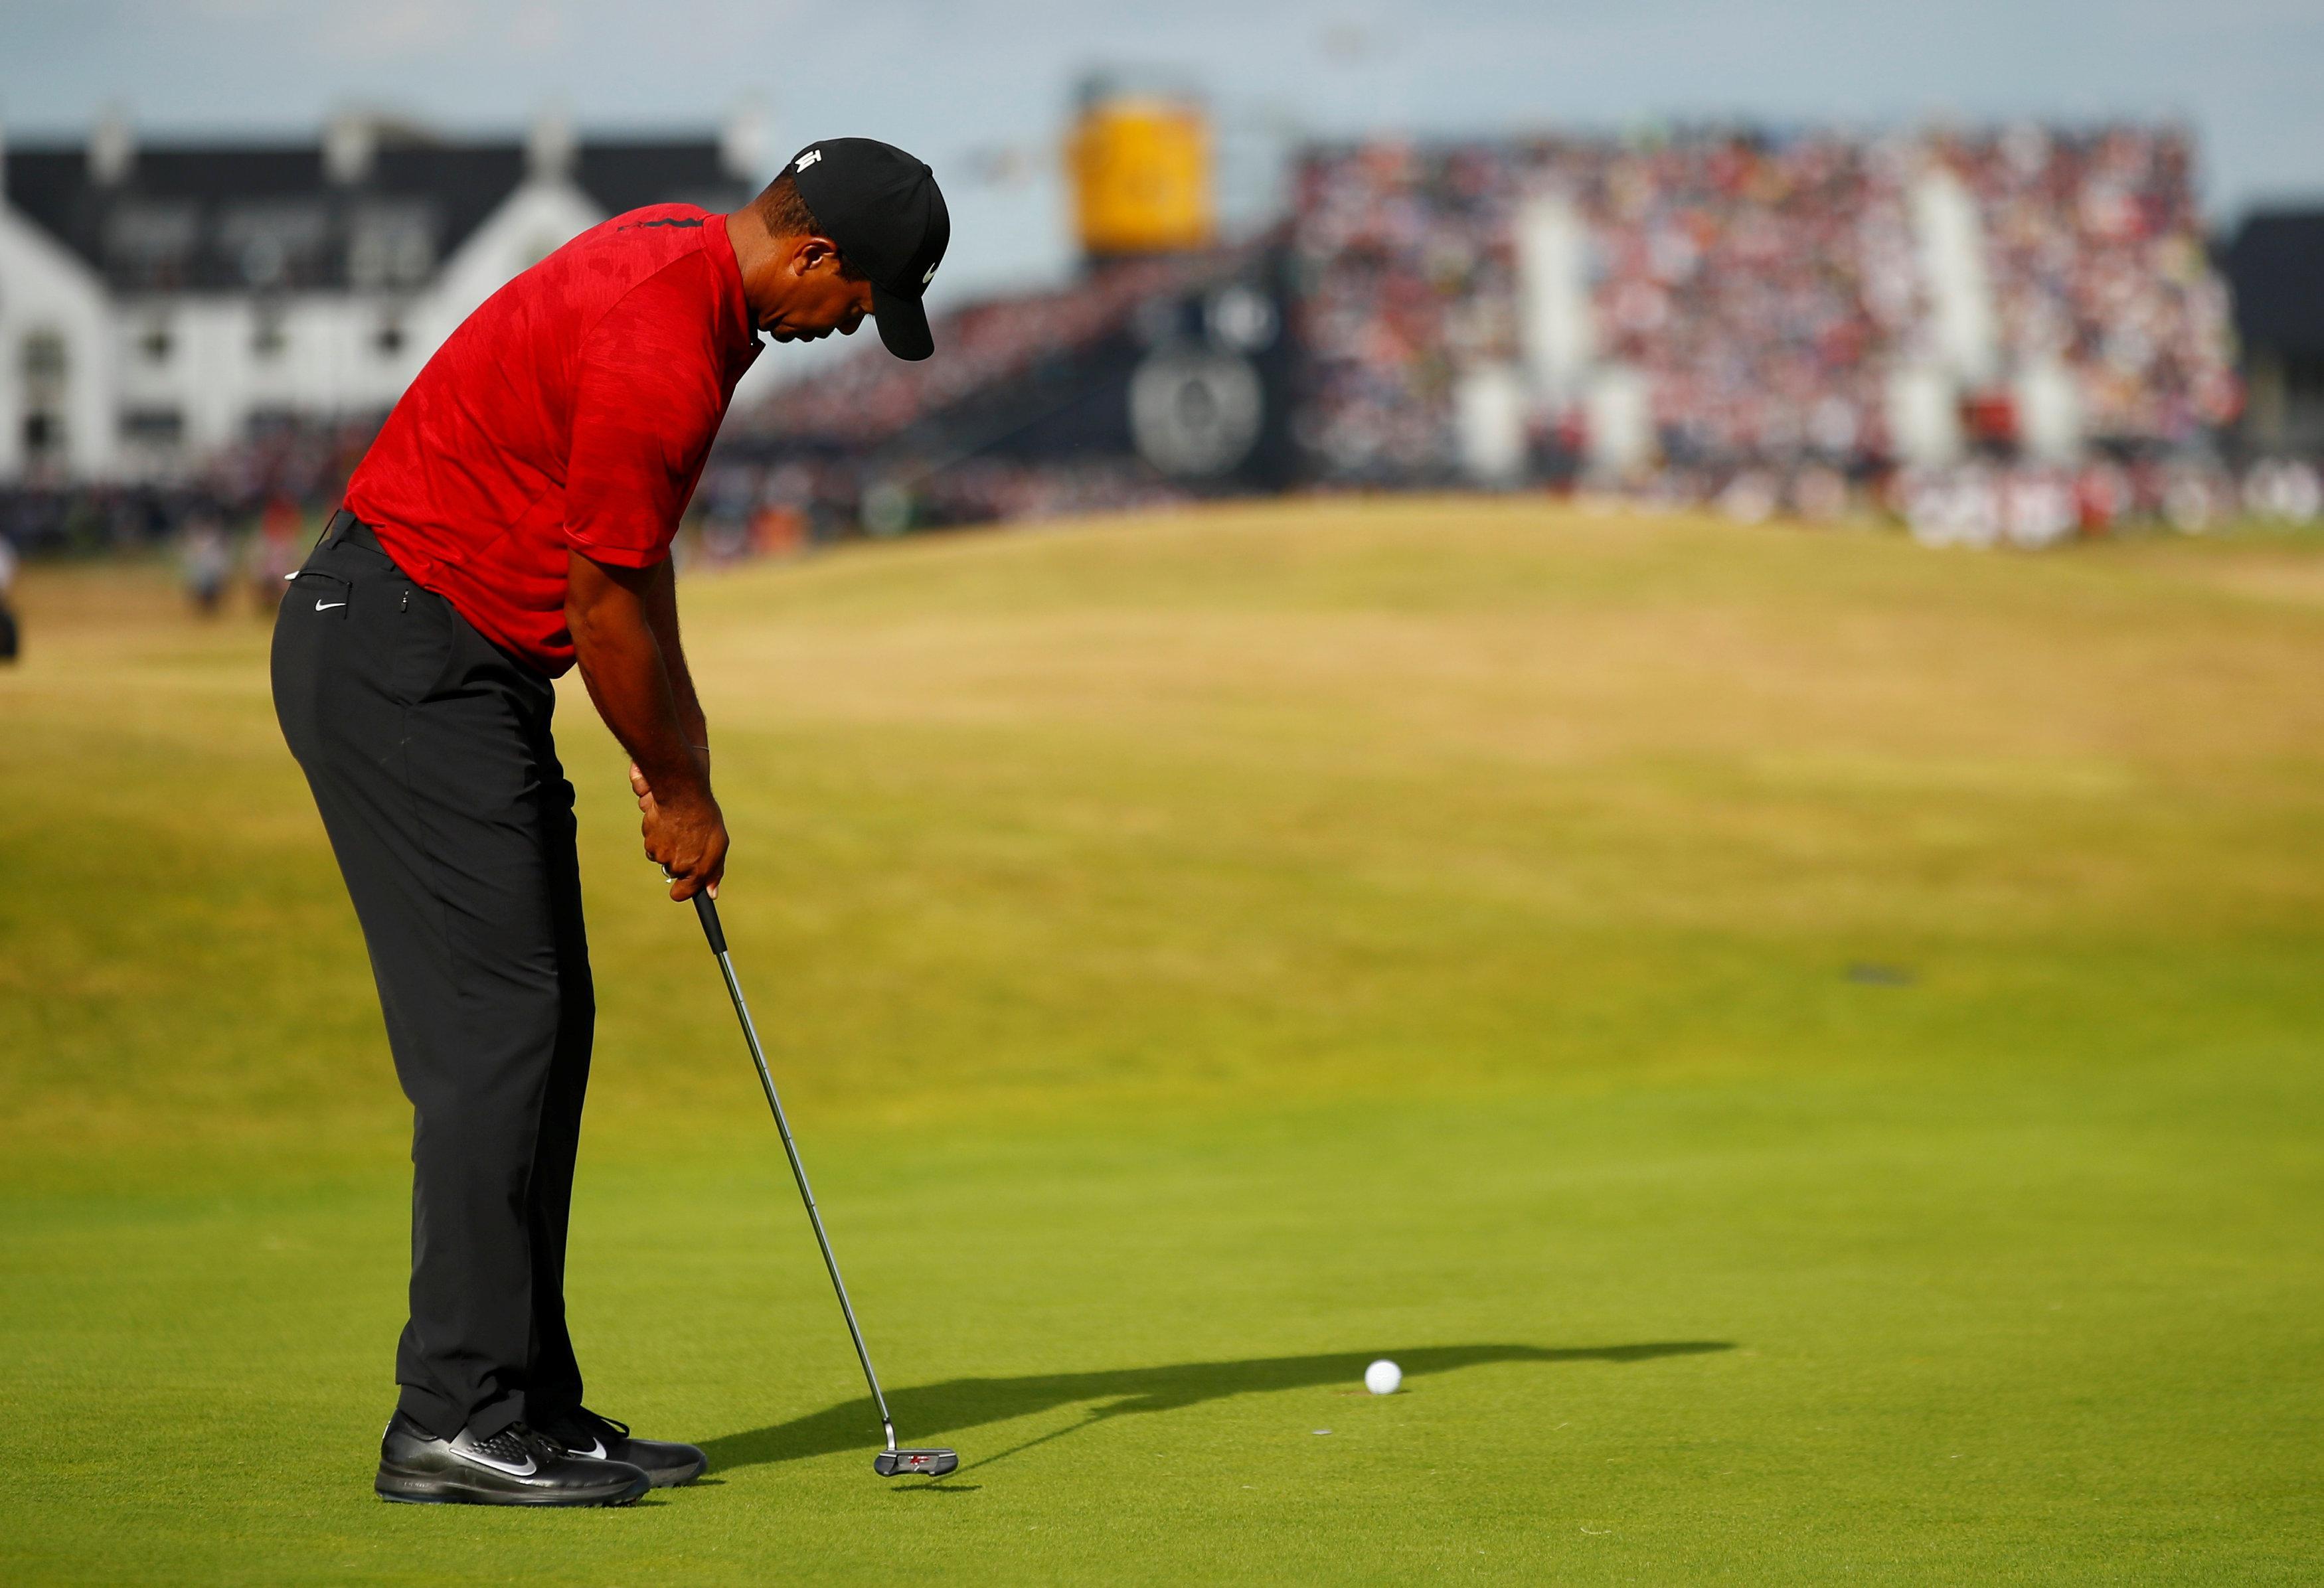 Tiger Woods eventually finished on 279, just three shots off Francesco Molinari